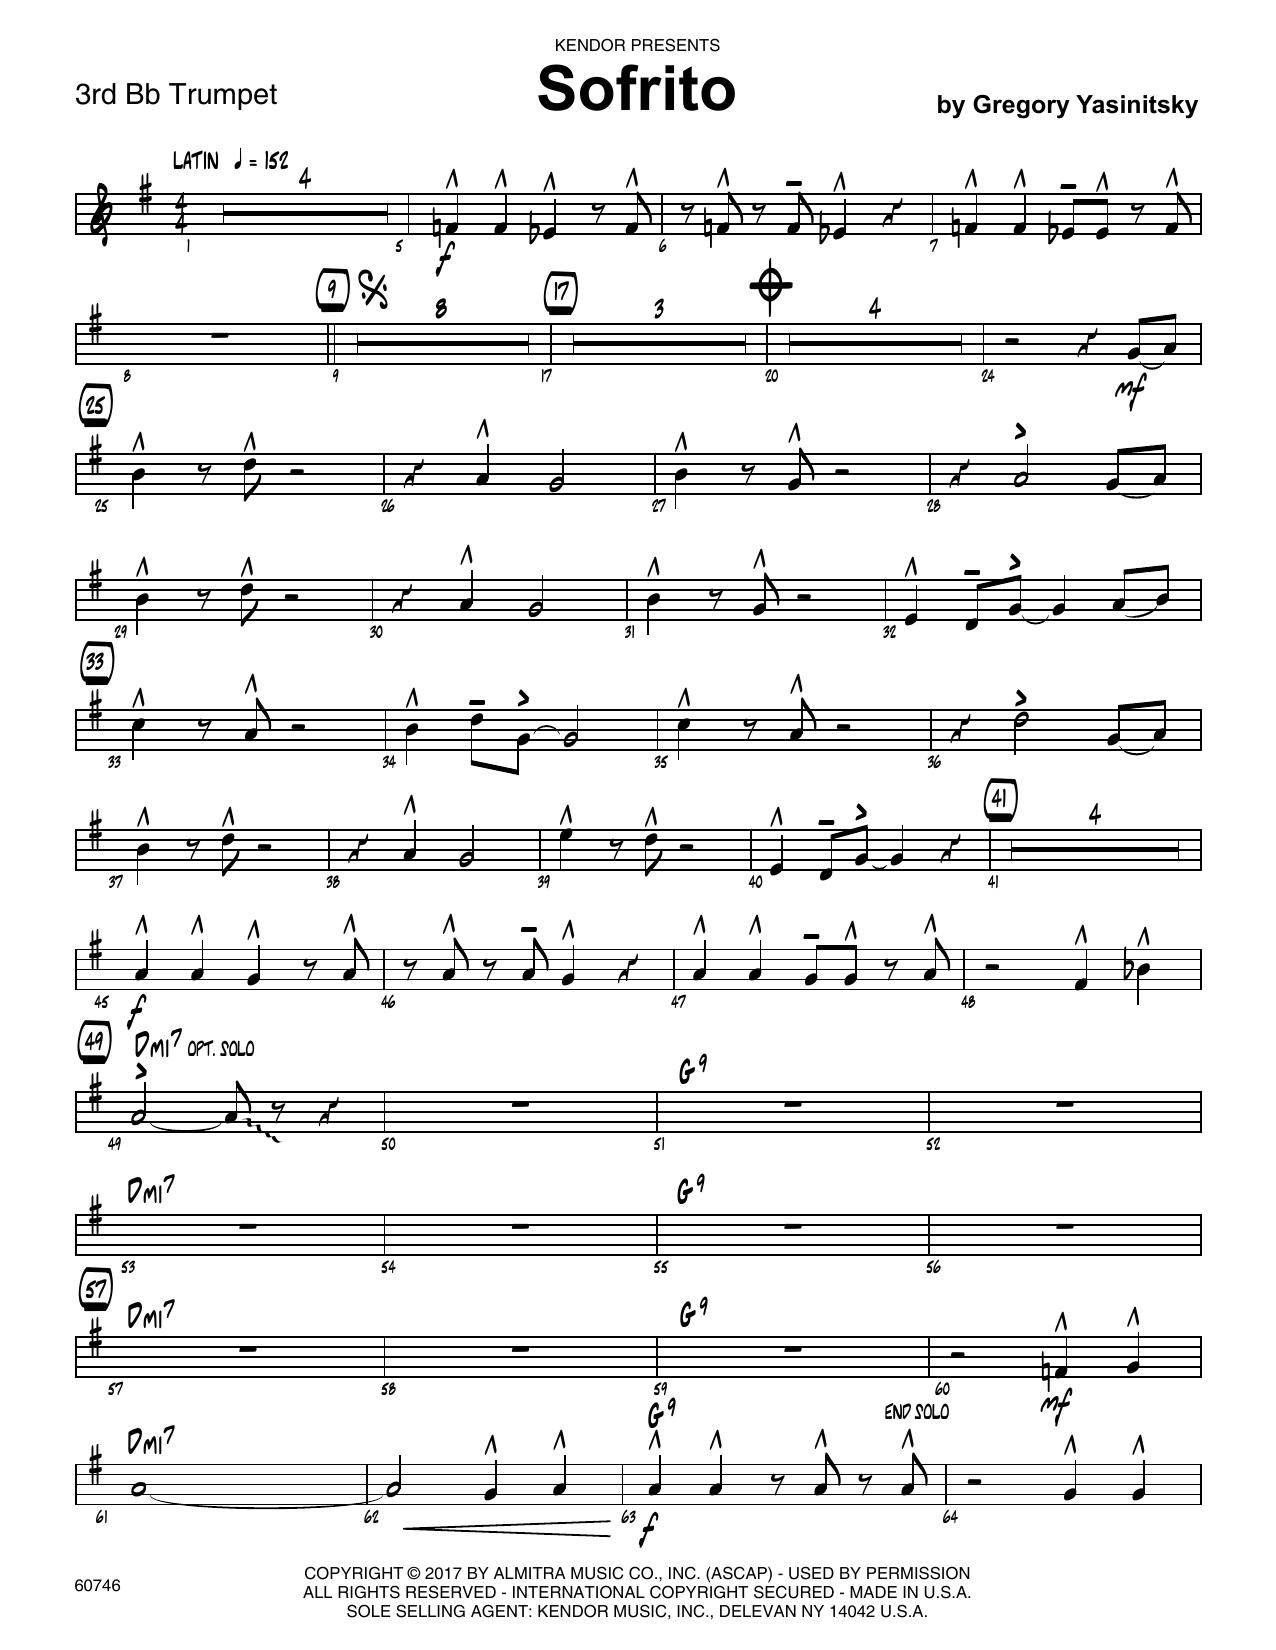 Sofrito - 3rd Bb Trumpet Sheet Music